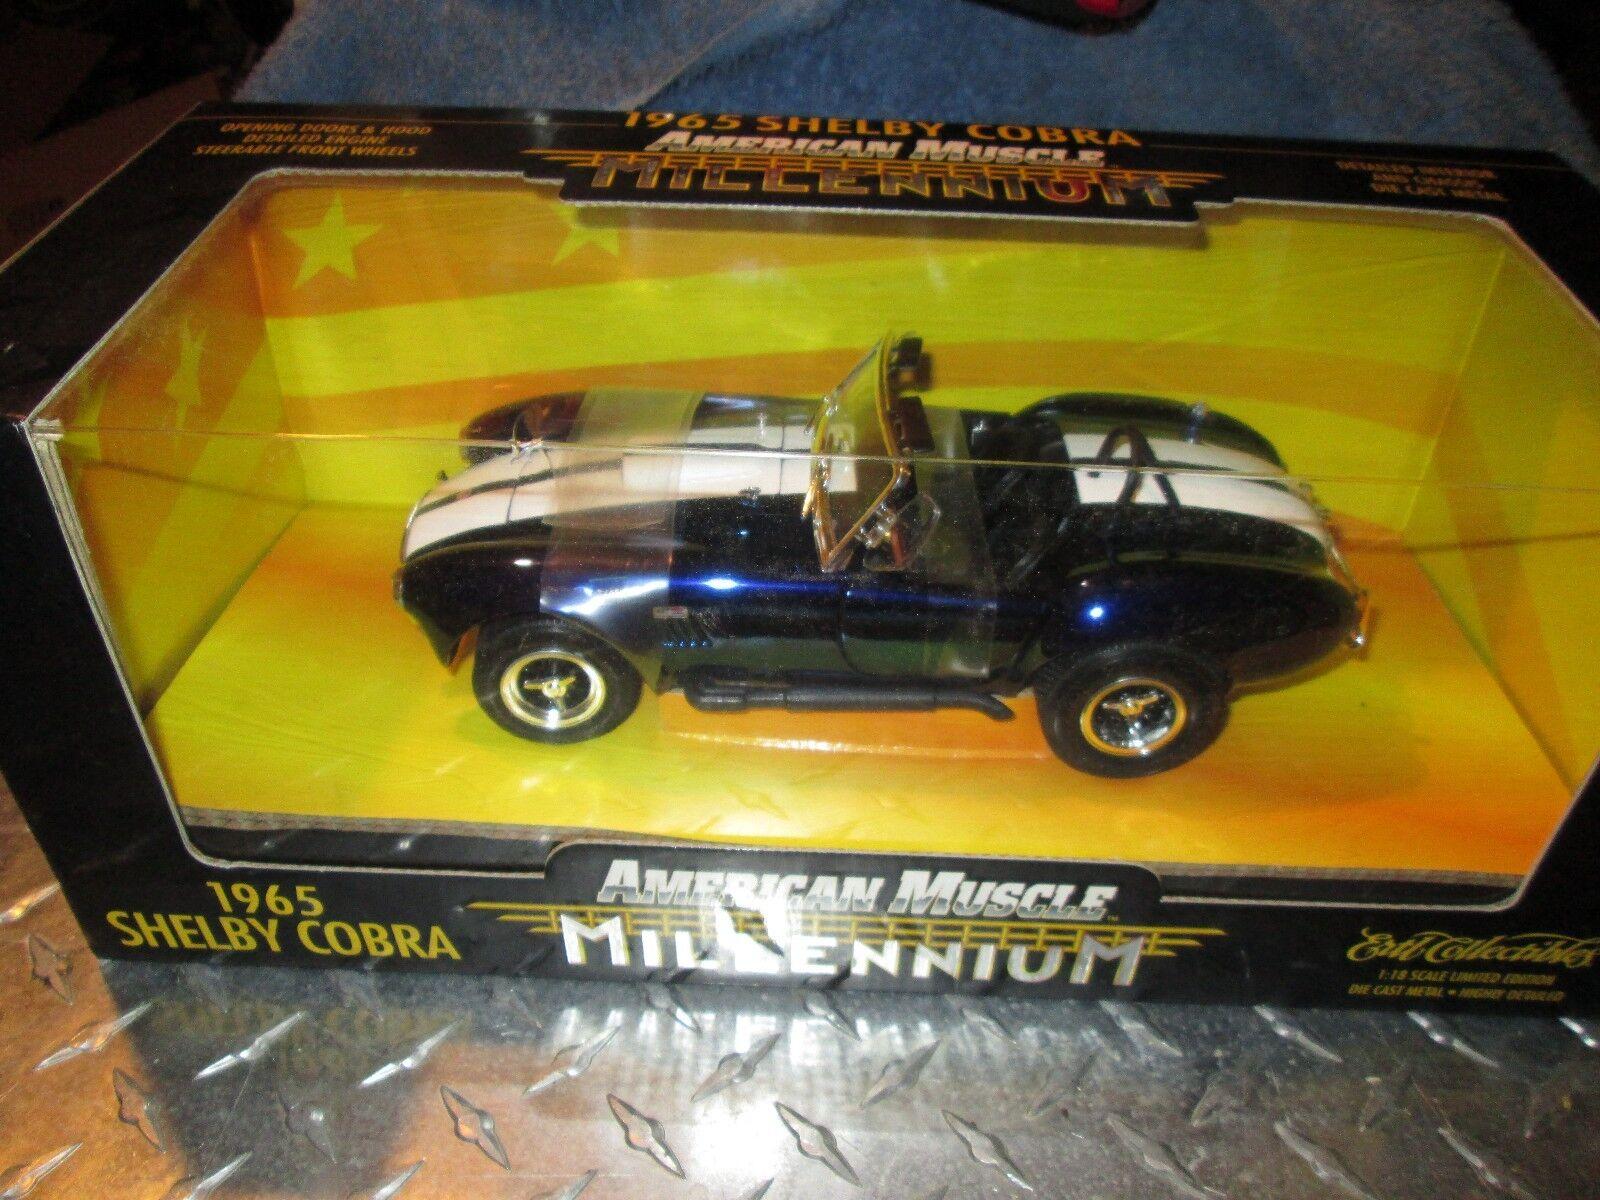 1965 Shelby Cobra Roadster Milenio American Muscle 1 18 blu Cromo Chase limitada